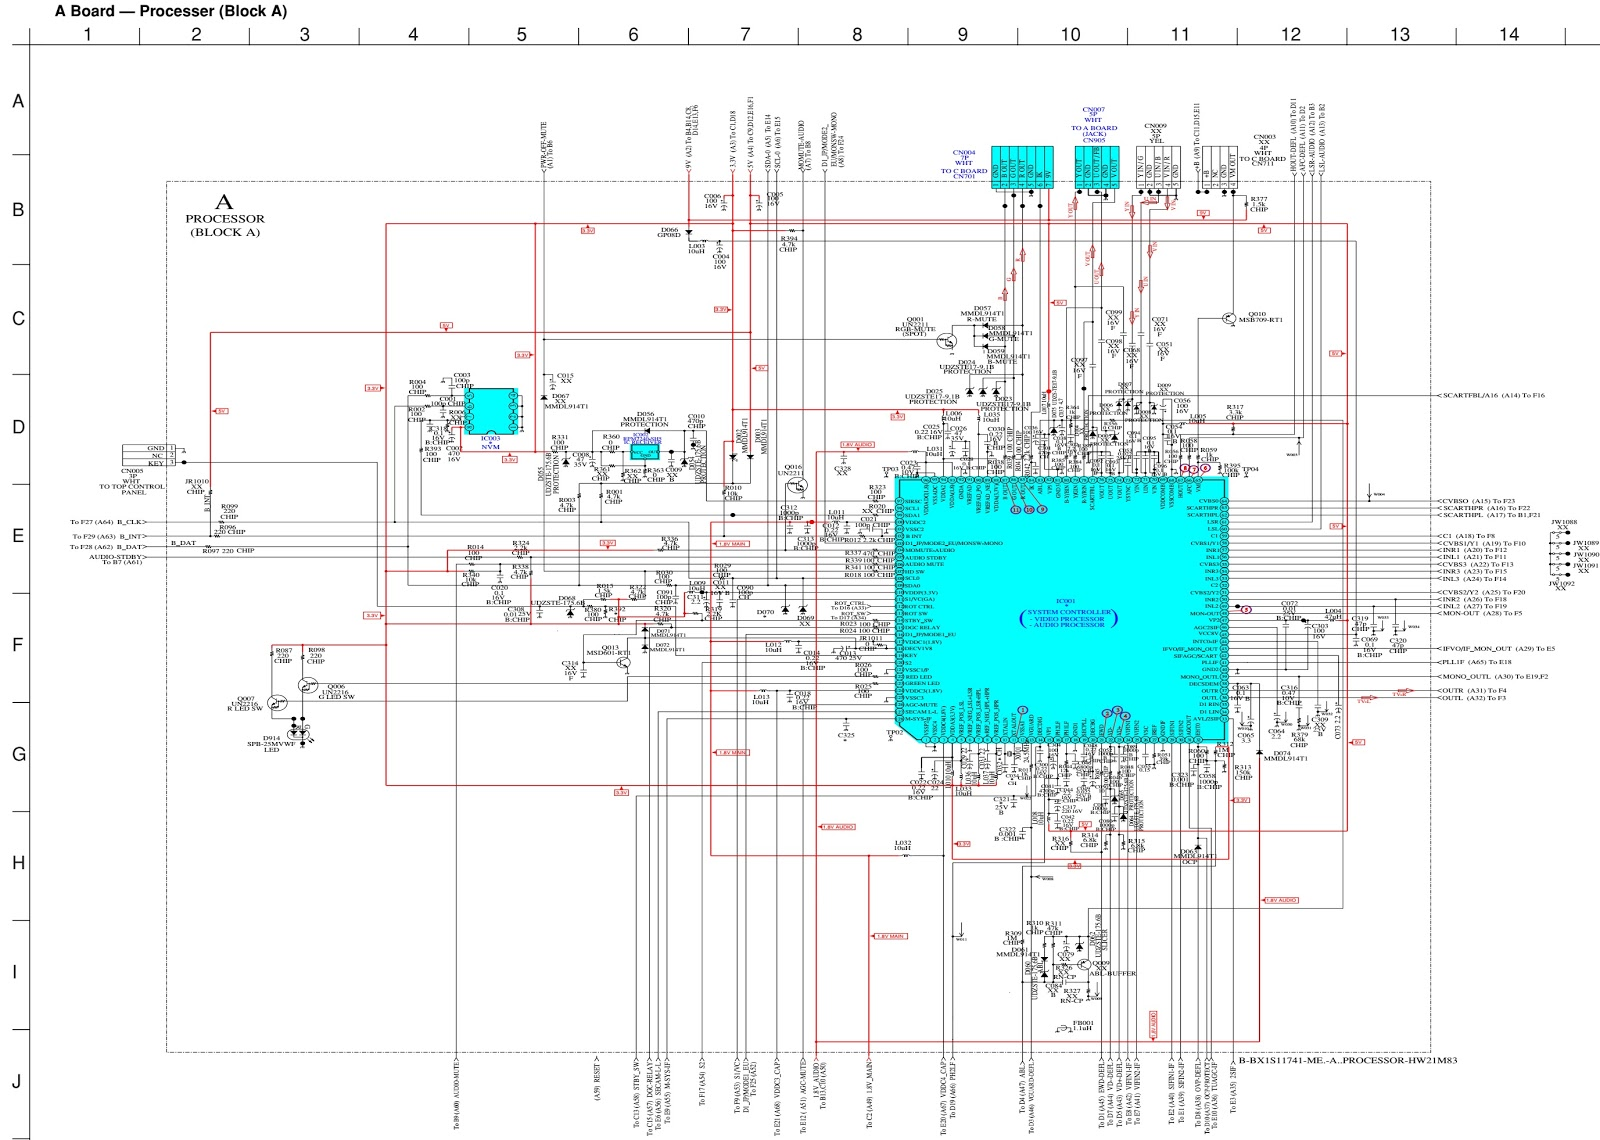 medium resolution of kv hw21m50 sony trinitron crt tv circuit diagram electro help audio block